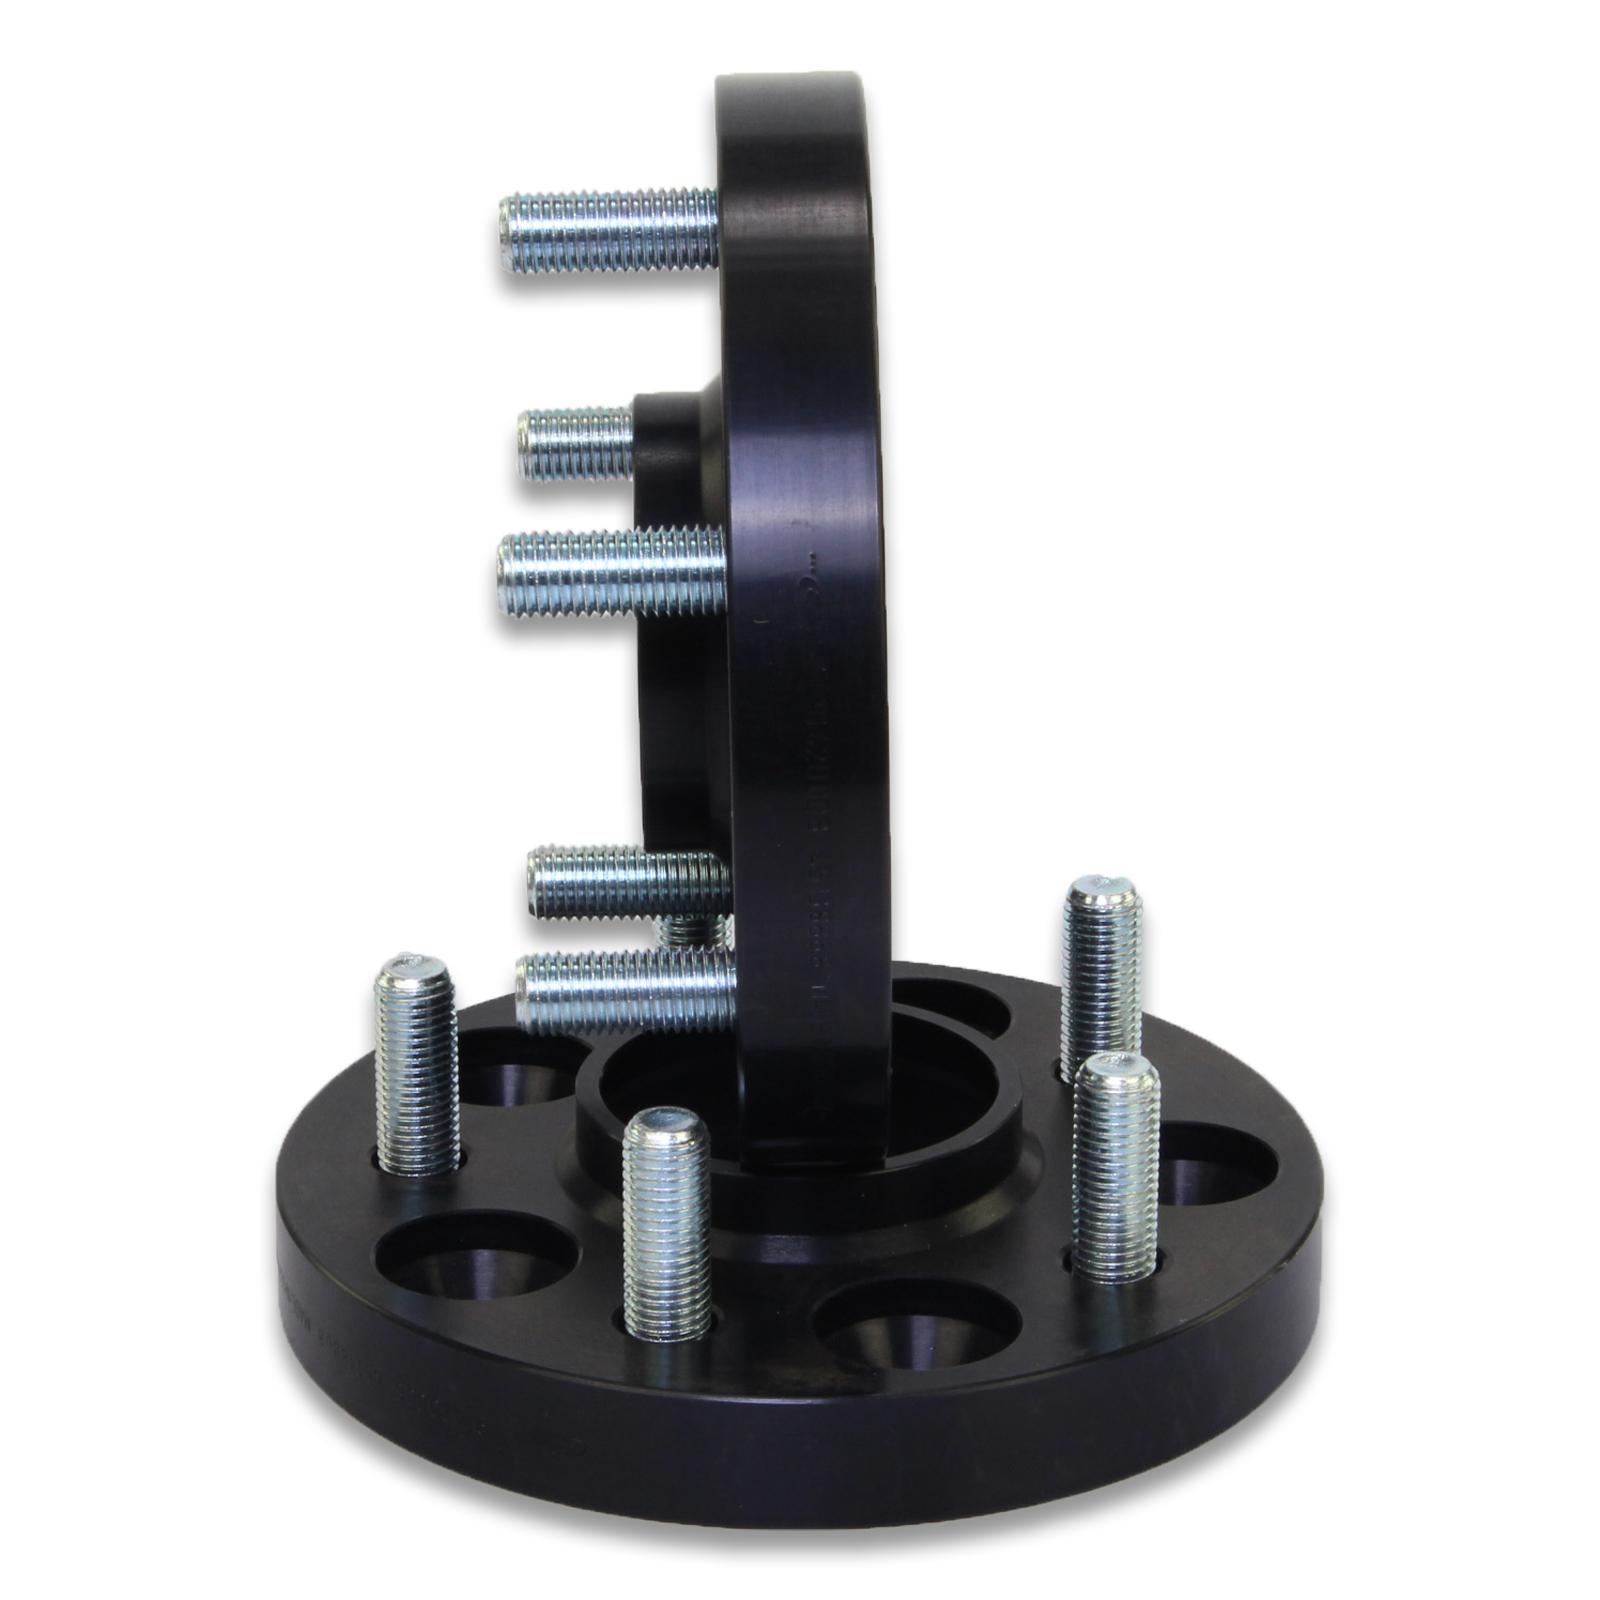 EIBACH Spurplatten Spurverbreiterung Distanzscheibe Ø63,3 5x108 40mm // 2x20mm